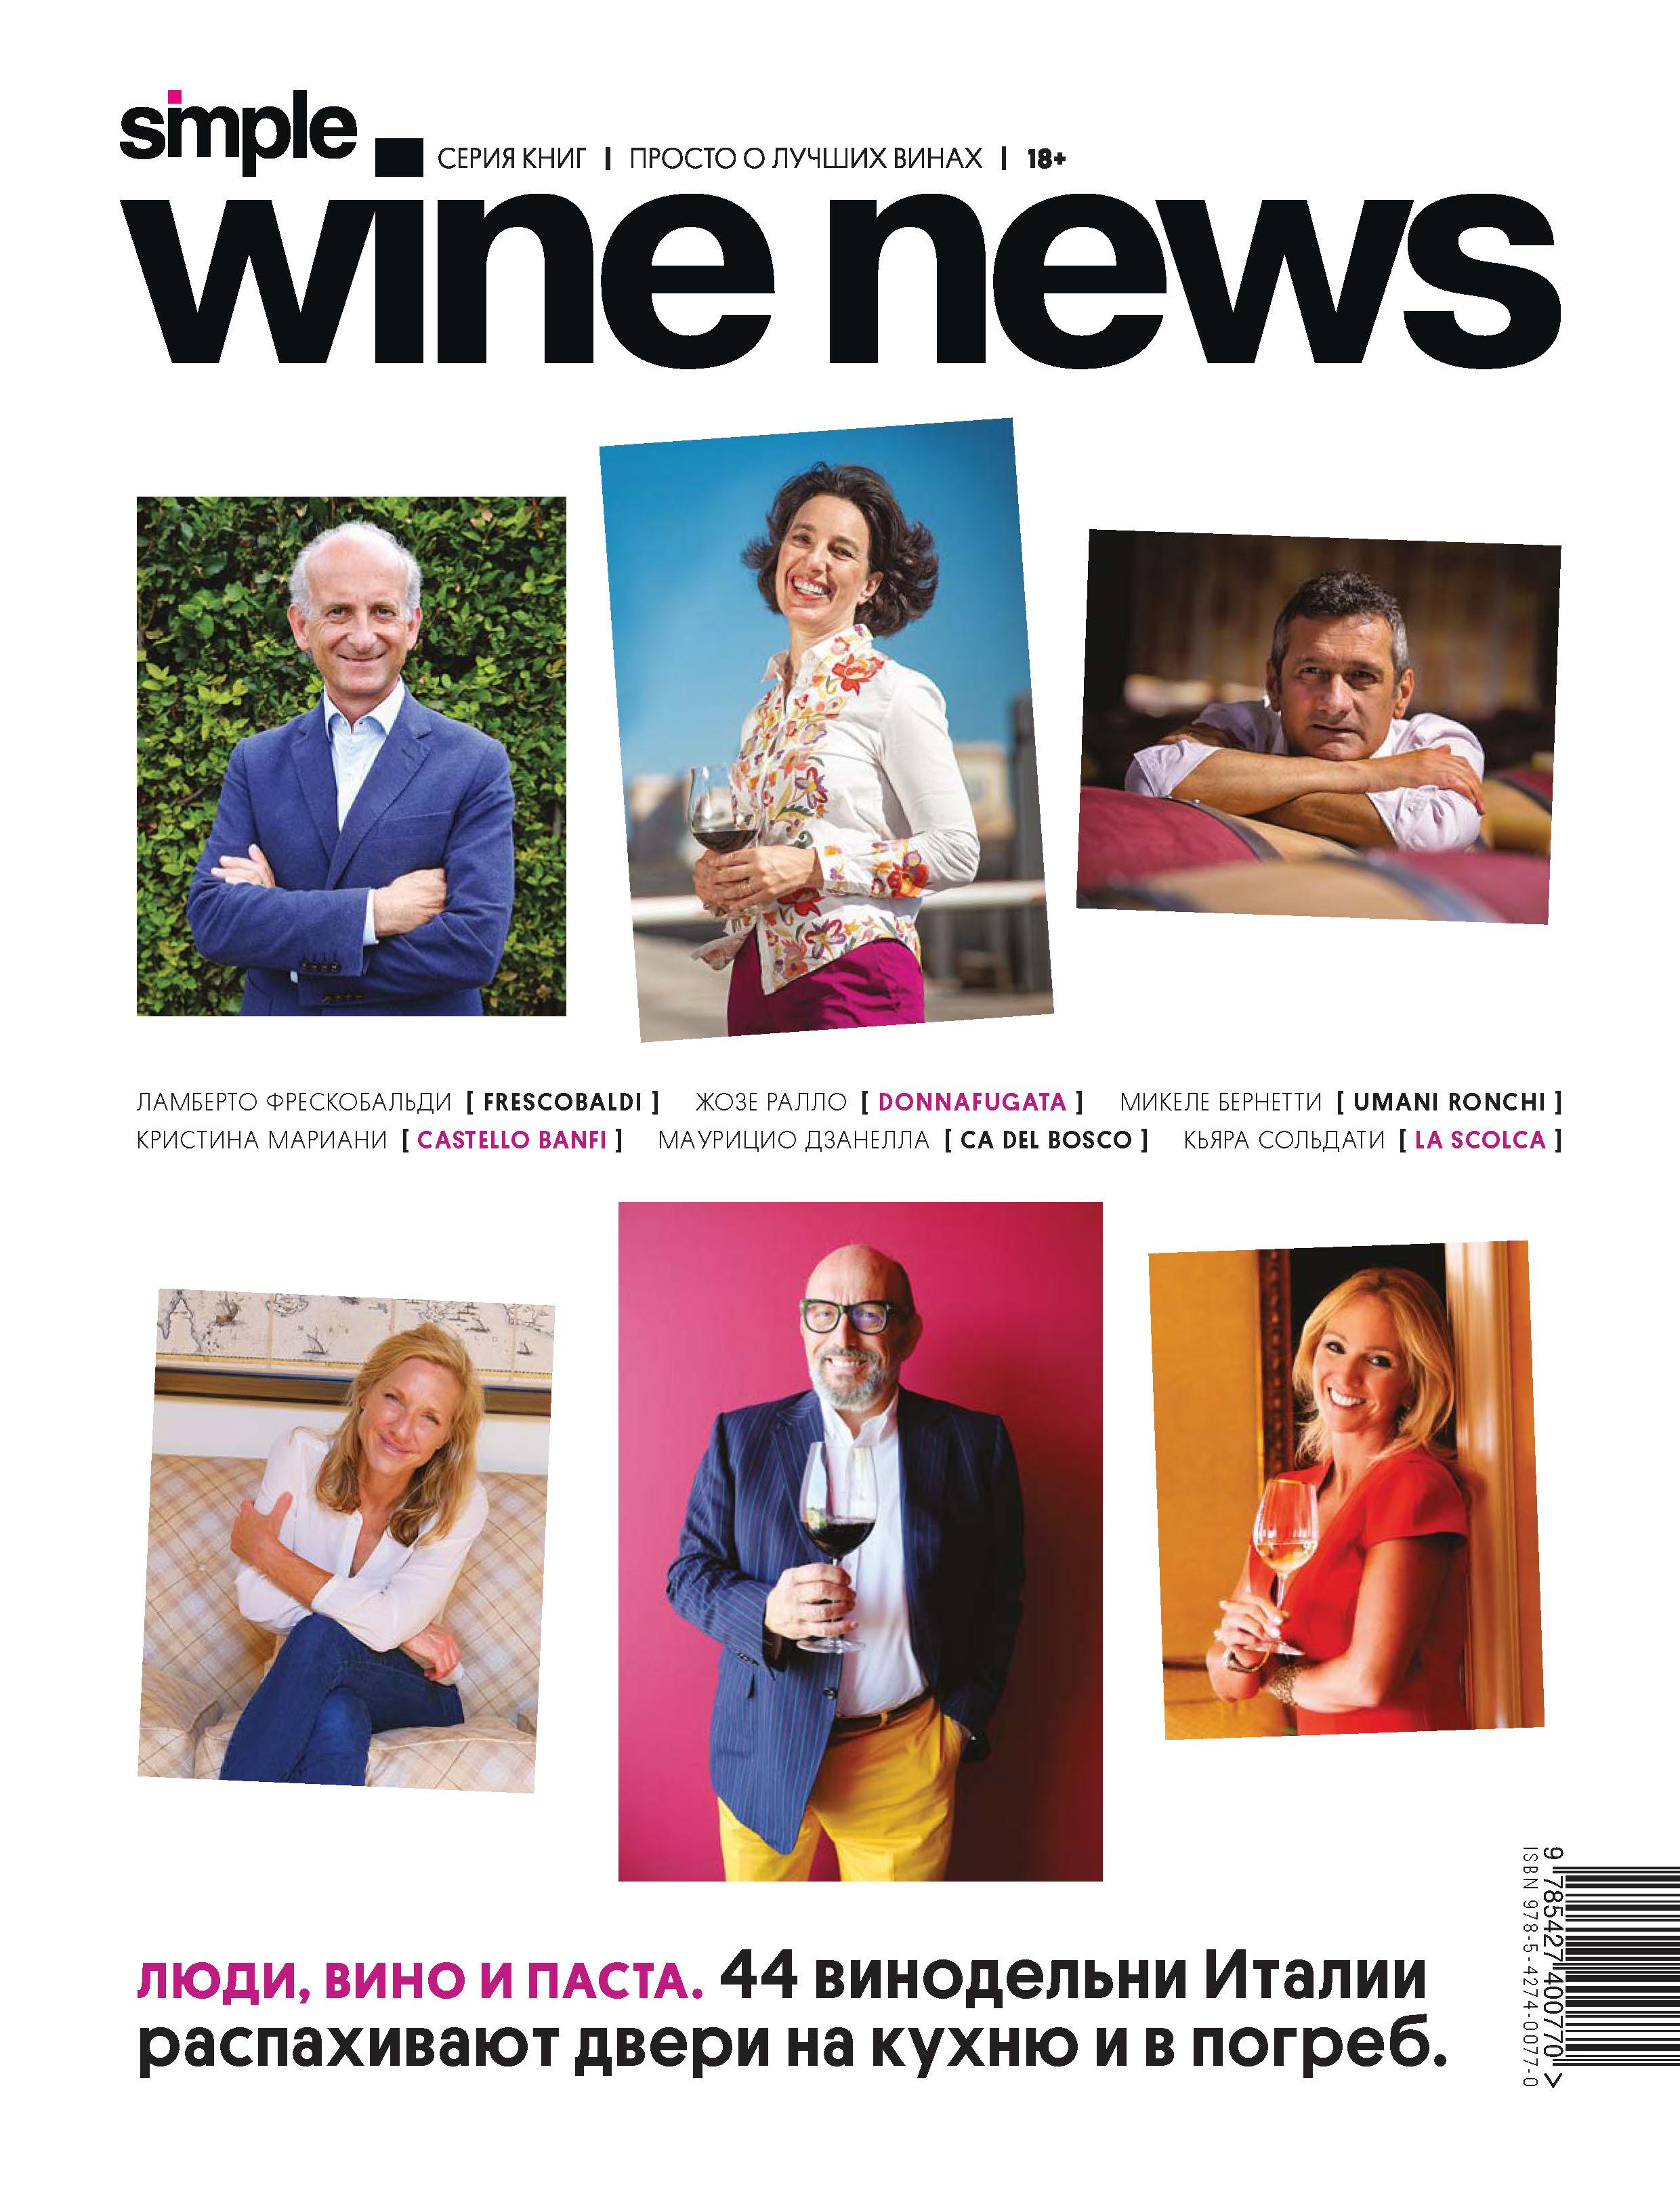 Италия: люди, вино и паста